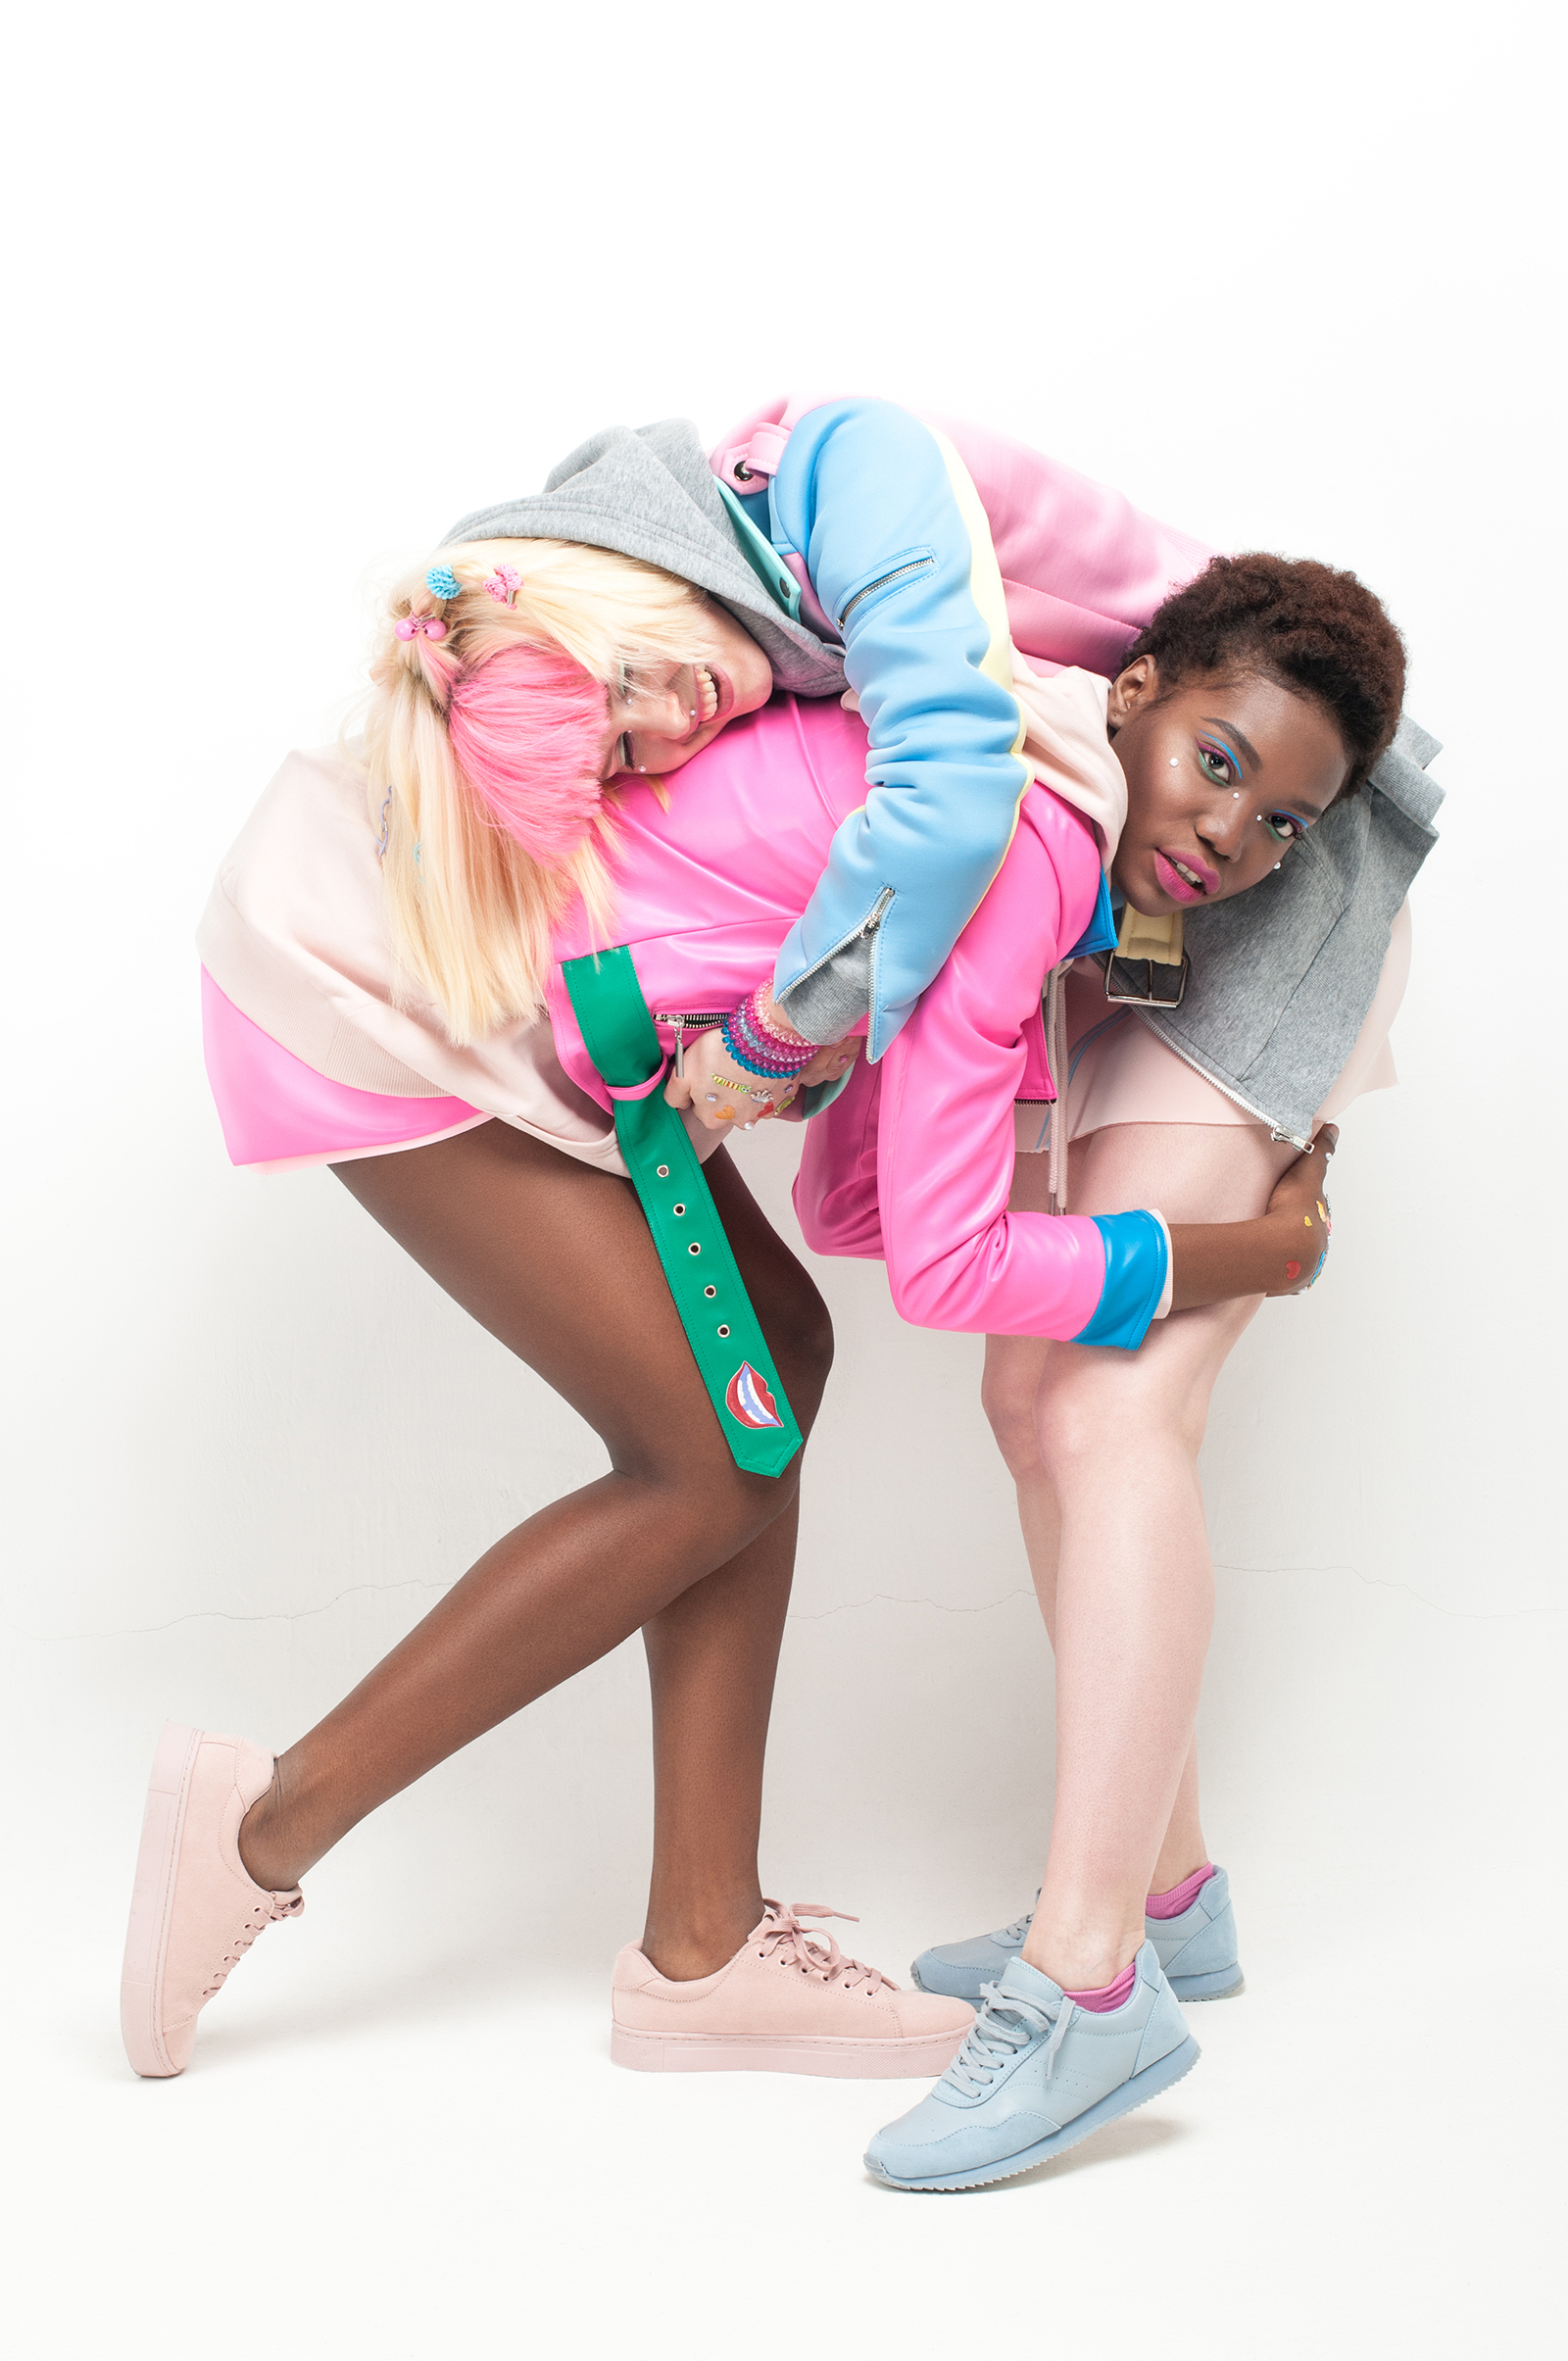 From left to right: Jacket: #LenaGolova  Hoody: Monki Skirt: #LenaGolova Choker: Diva Pink sneakers: H&M Jacket: #LenaGolova Hoody: H&M Skirt: #LenaGolova Choker: Accessorize and #LenaGolova Socks: Nike Blue sneakers: H&M